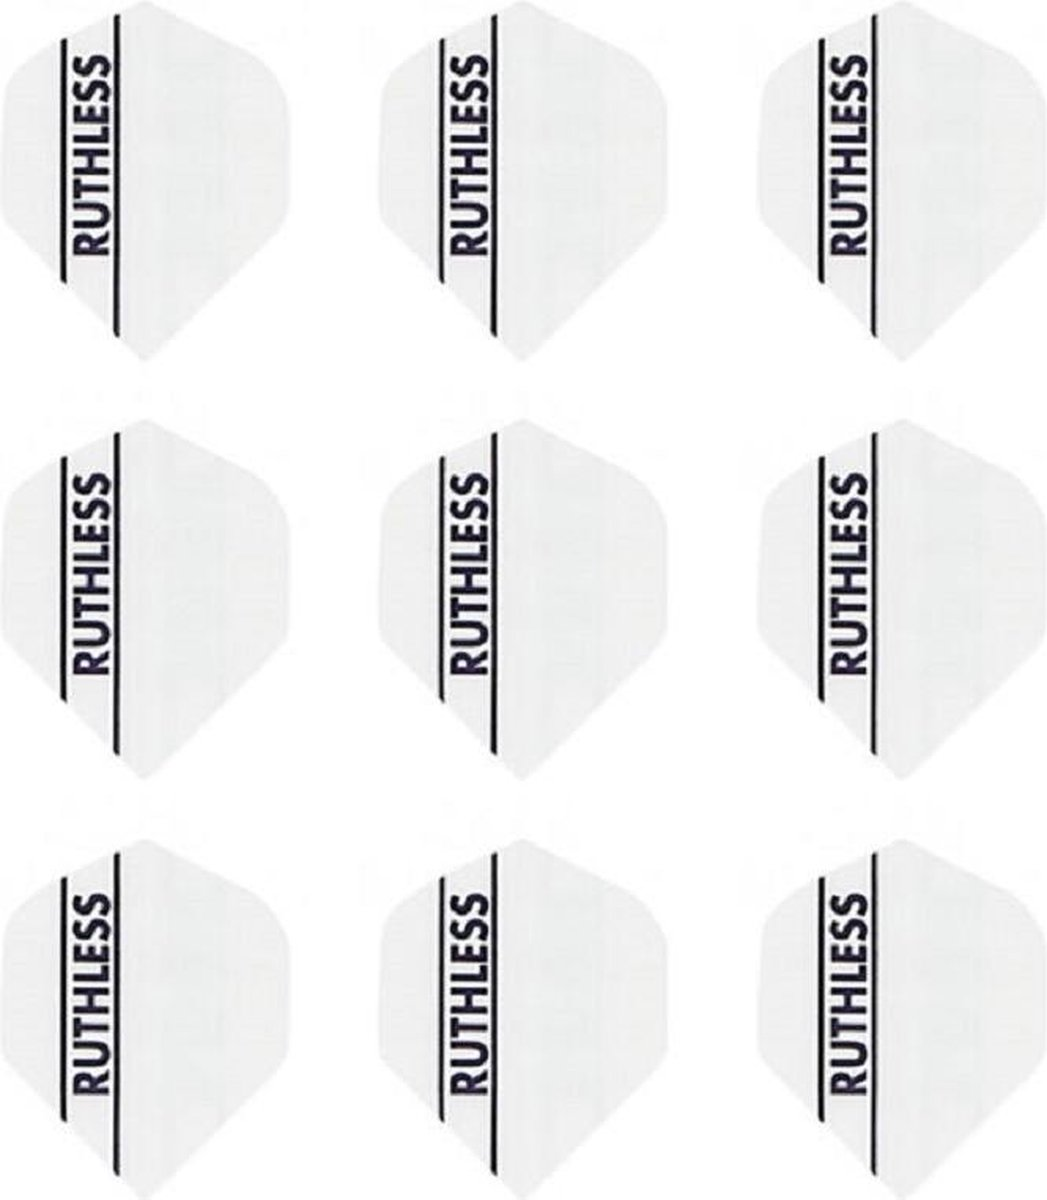 10 sets (30 stuks) Ruthless flights Multipack - Solid White - darts flights